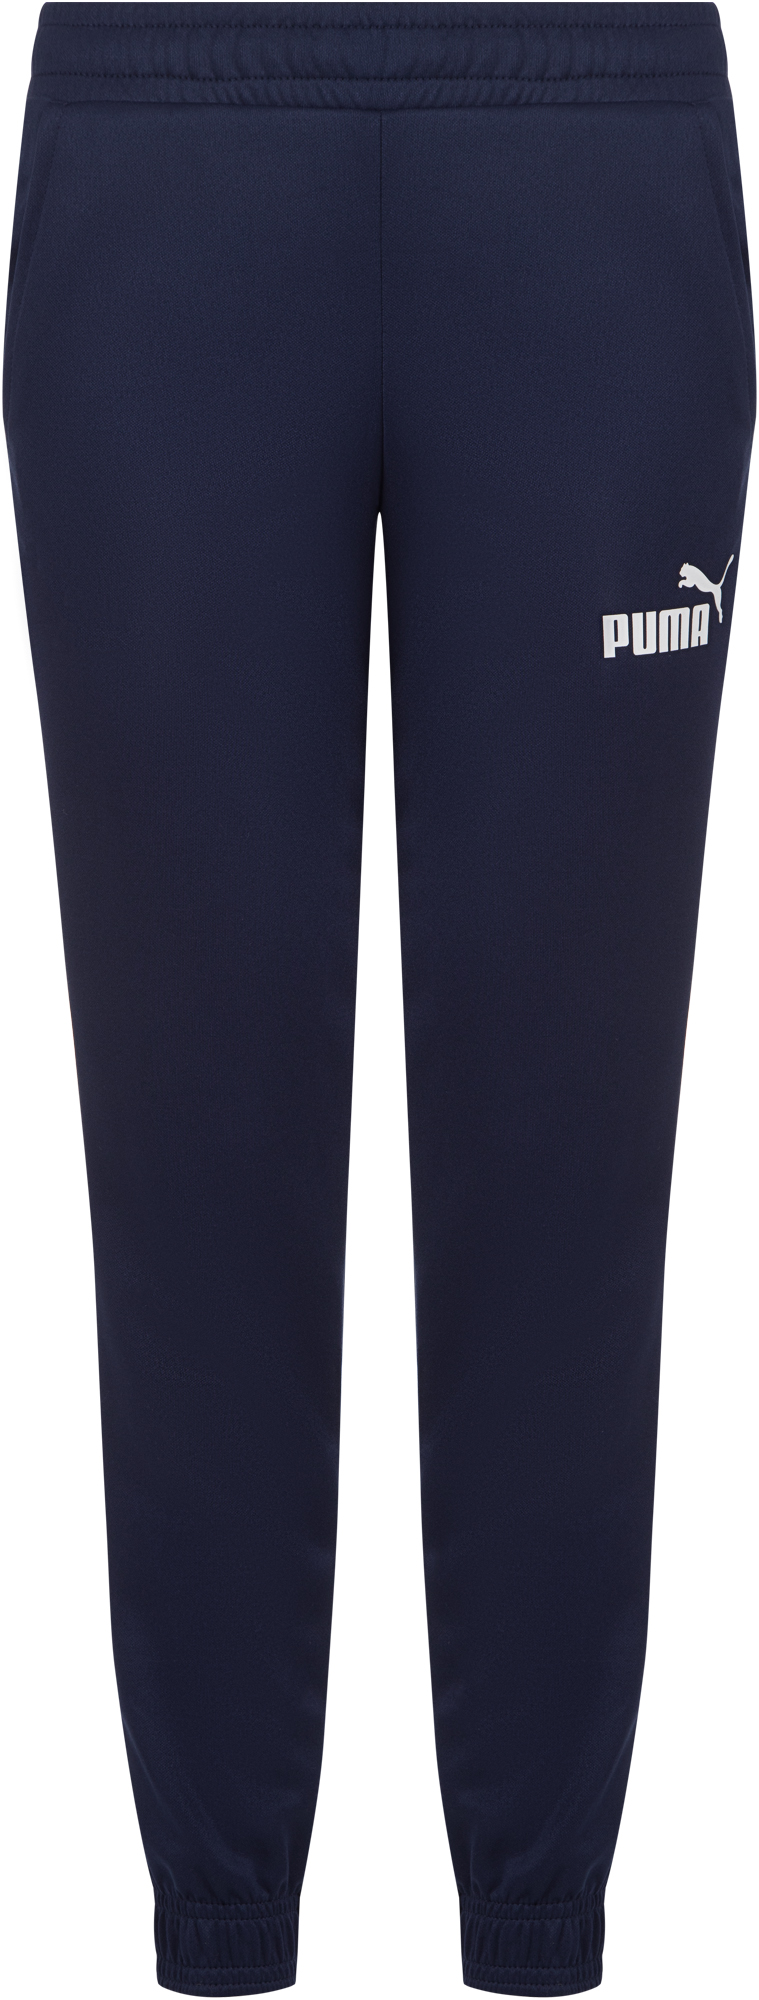 Puma Брюки для мальчиков Puma ESS Logo Poly, размер 164 цена